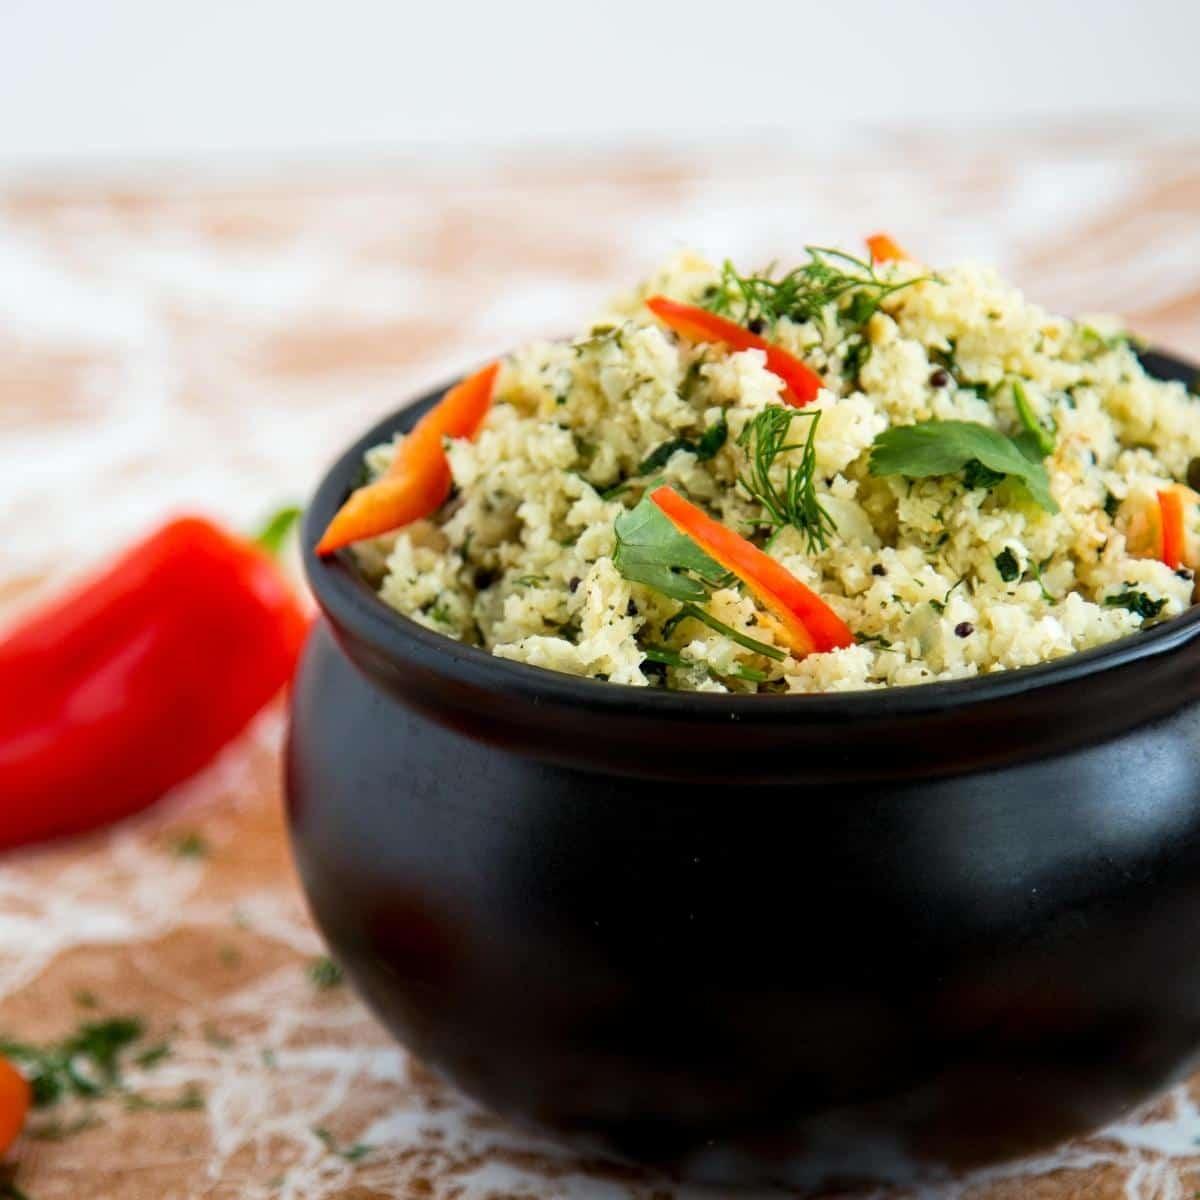 A bowl of cauliflower rice pilaf